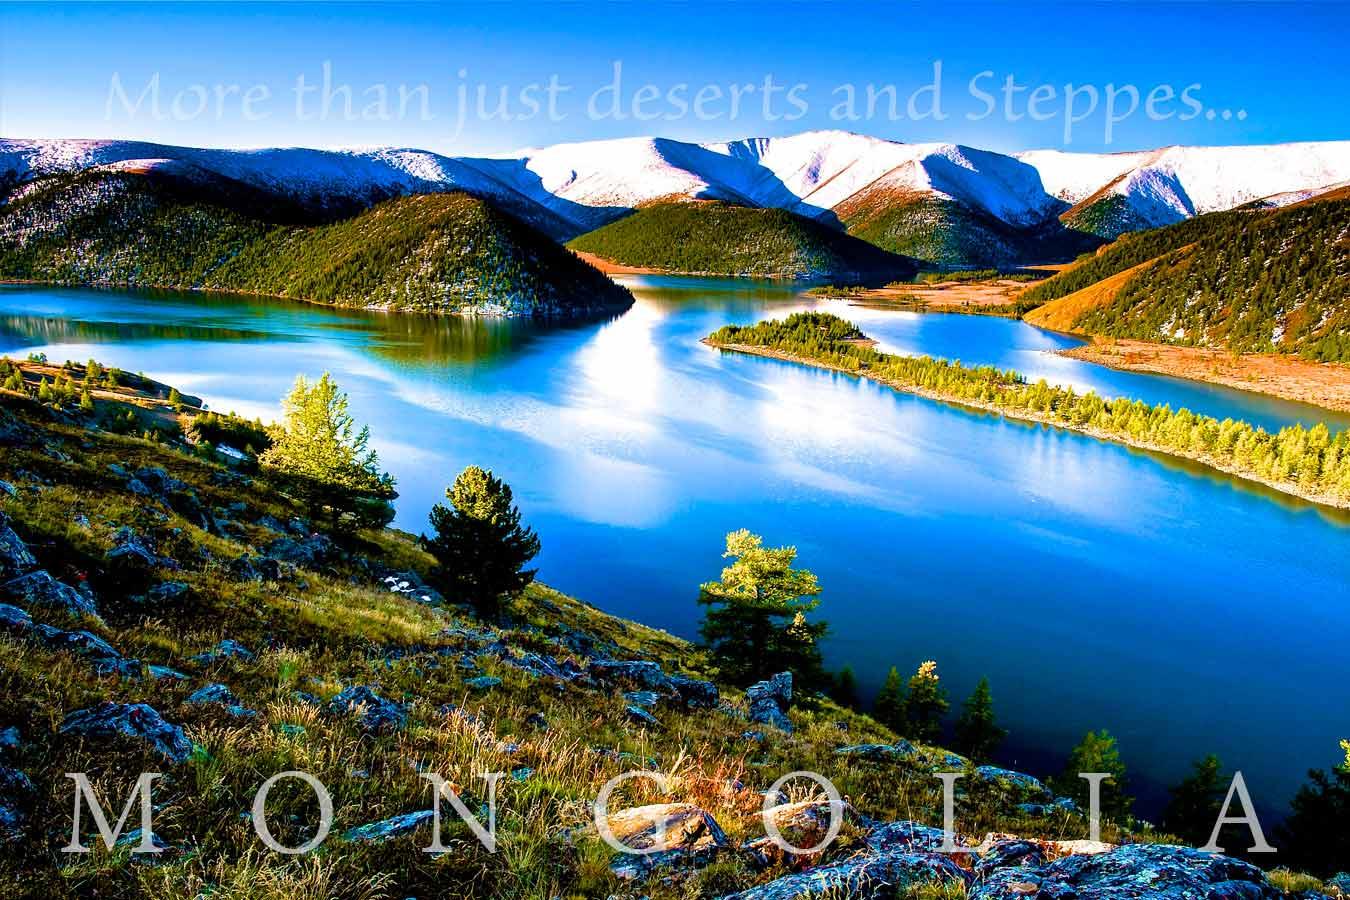 GER GER a Mongolia Equitación, Overland, Viajes Culturales, Trekking, estancias con familias, Cine TV